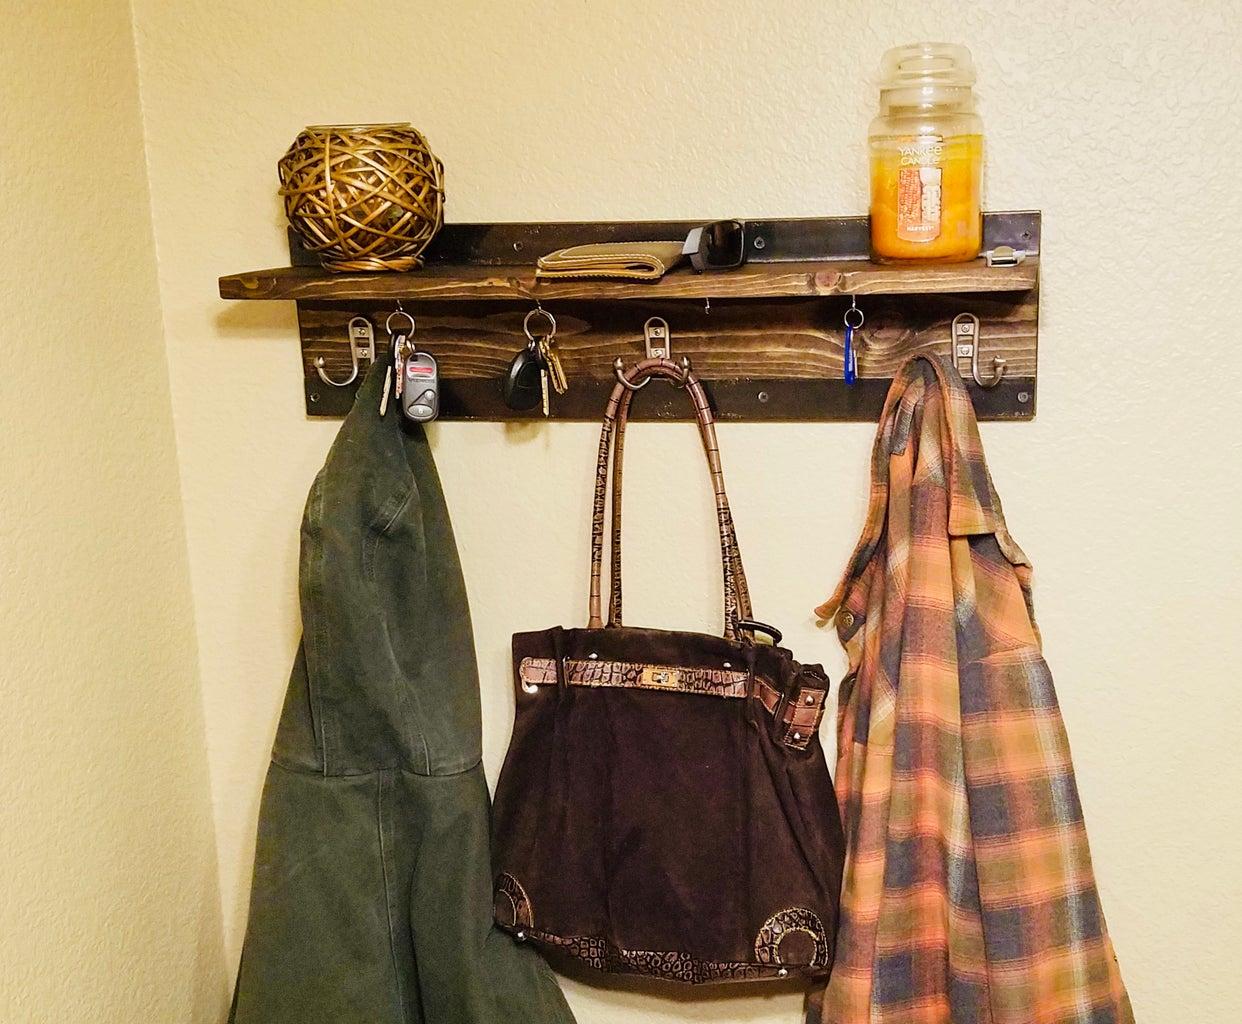 All-In-One Rustic Coat Rack, Floating Shelf Key Ring